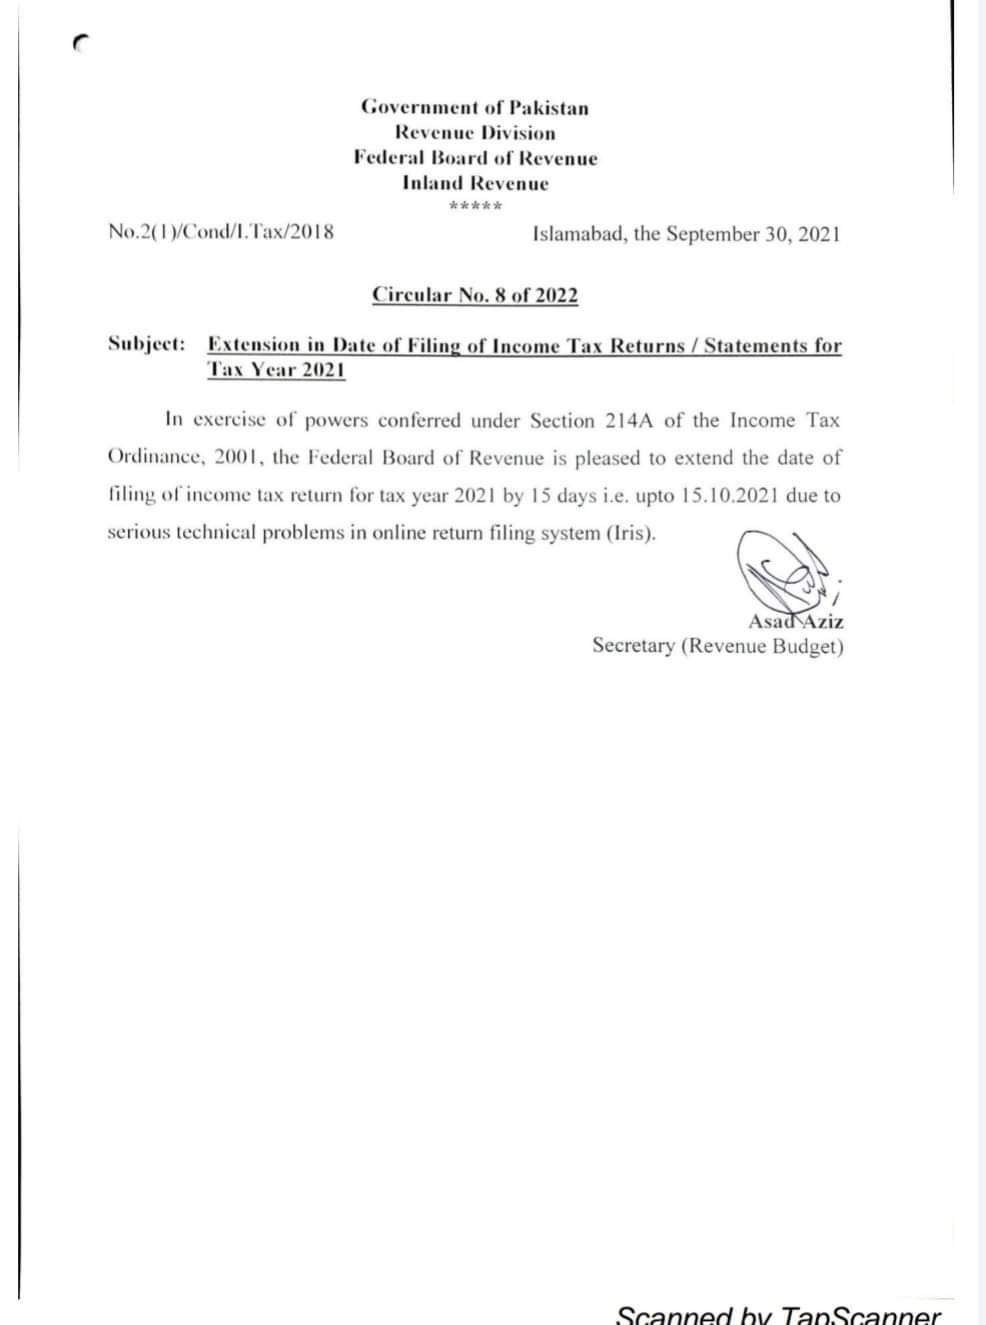 FBR Date Extend Letter 15 Oct